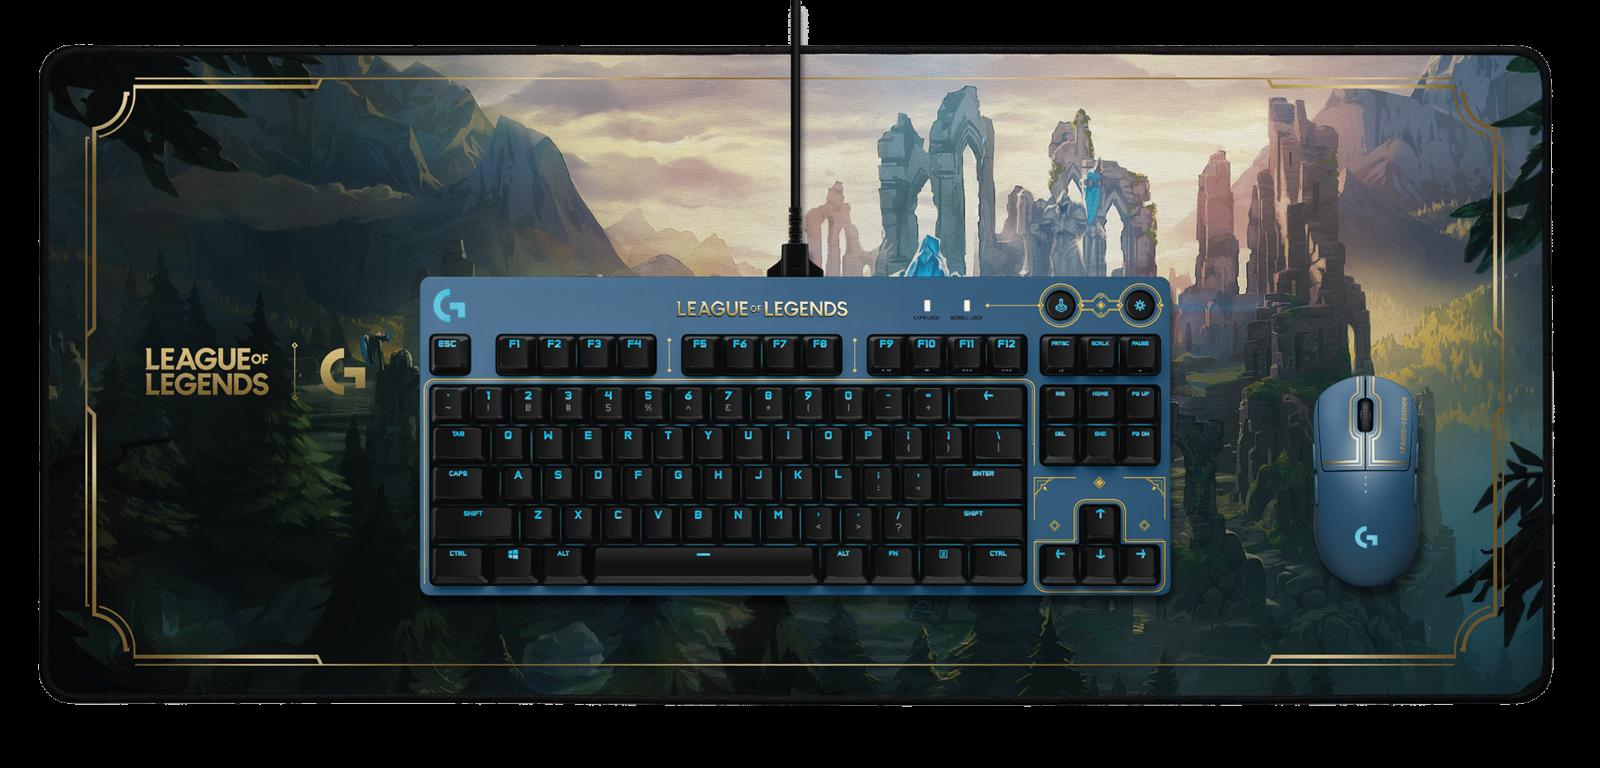 Diamo uno sguardo all setup da gaming ufficiale di League of Legends thumbnail